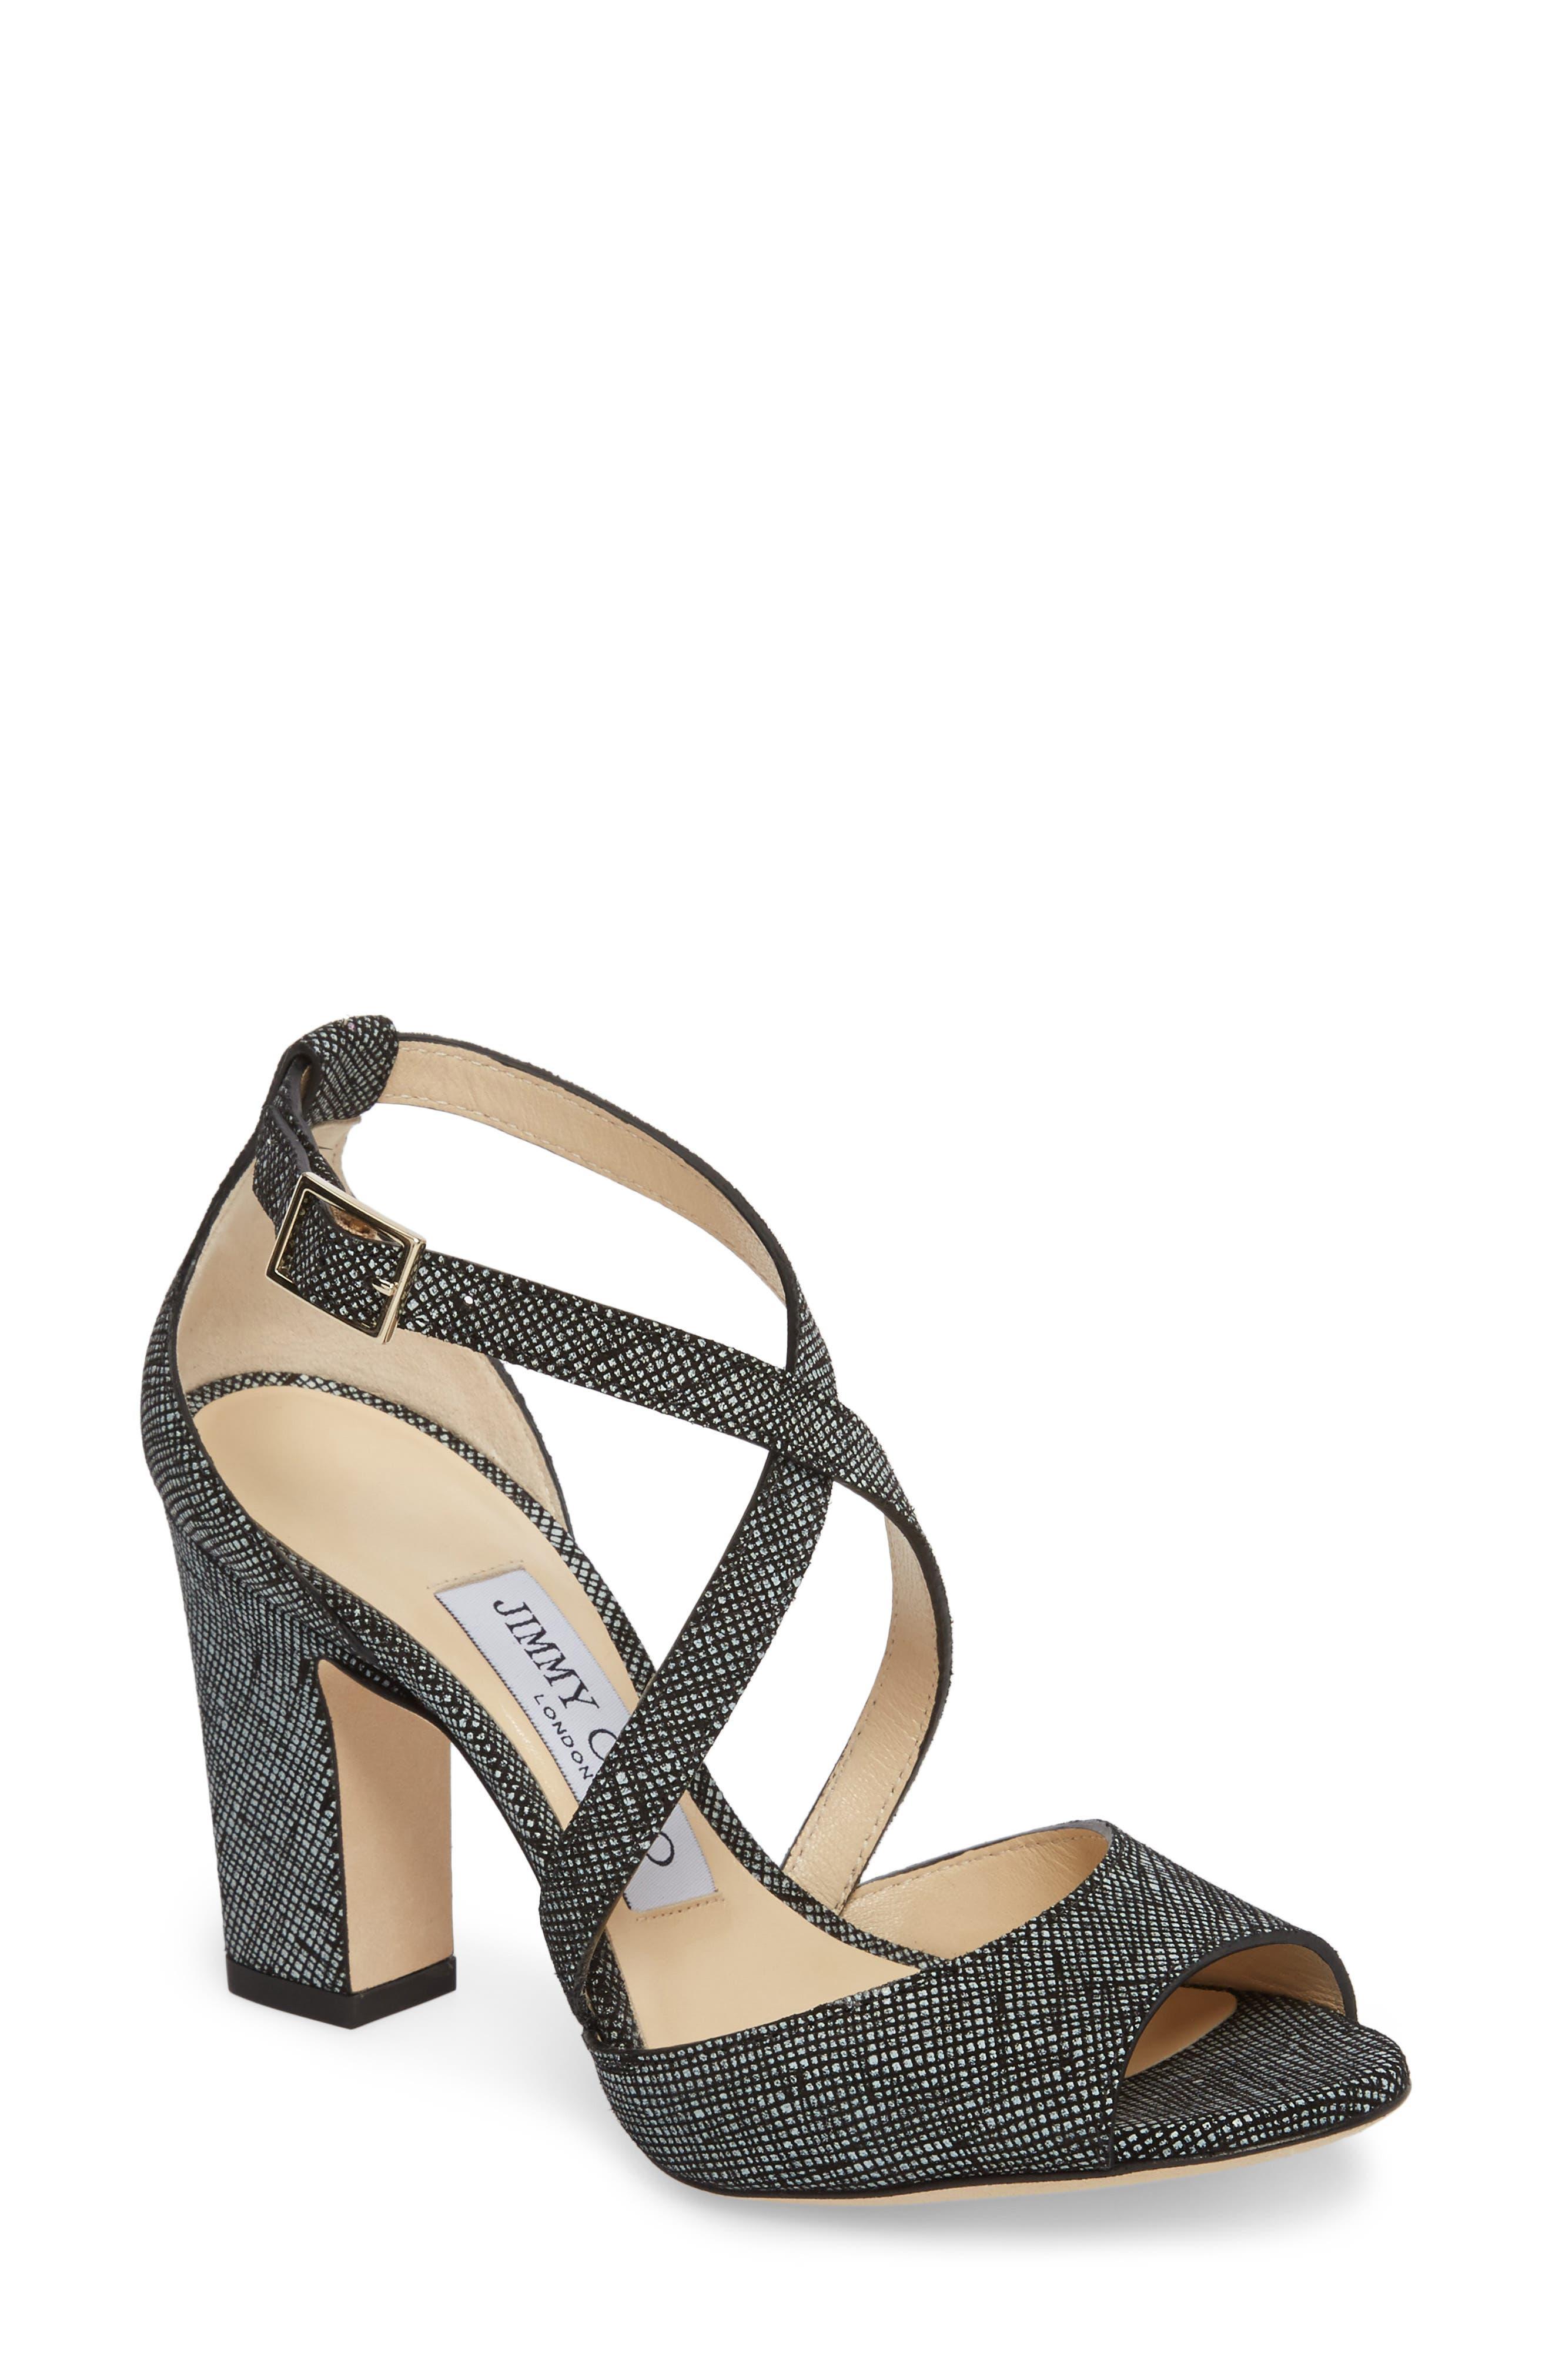 Carrie Cross Strap Sandal,                         Main,                         color, 001